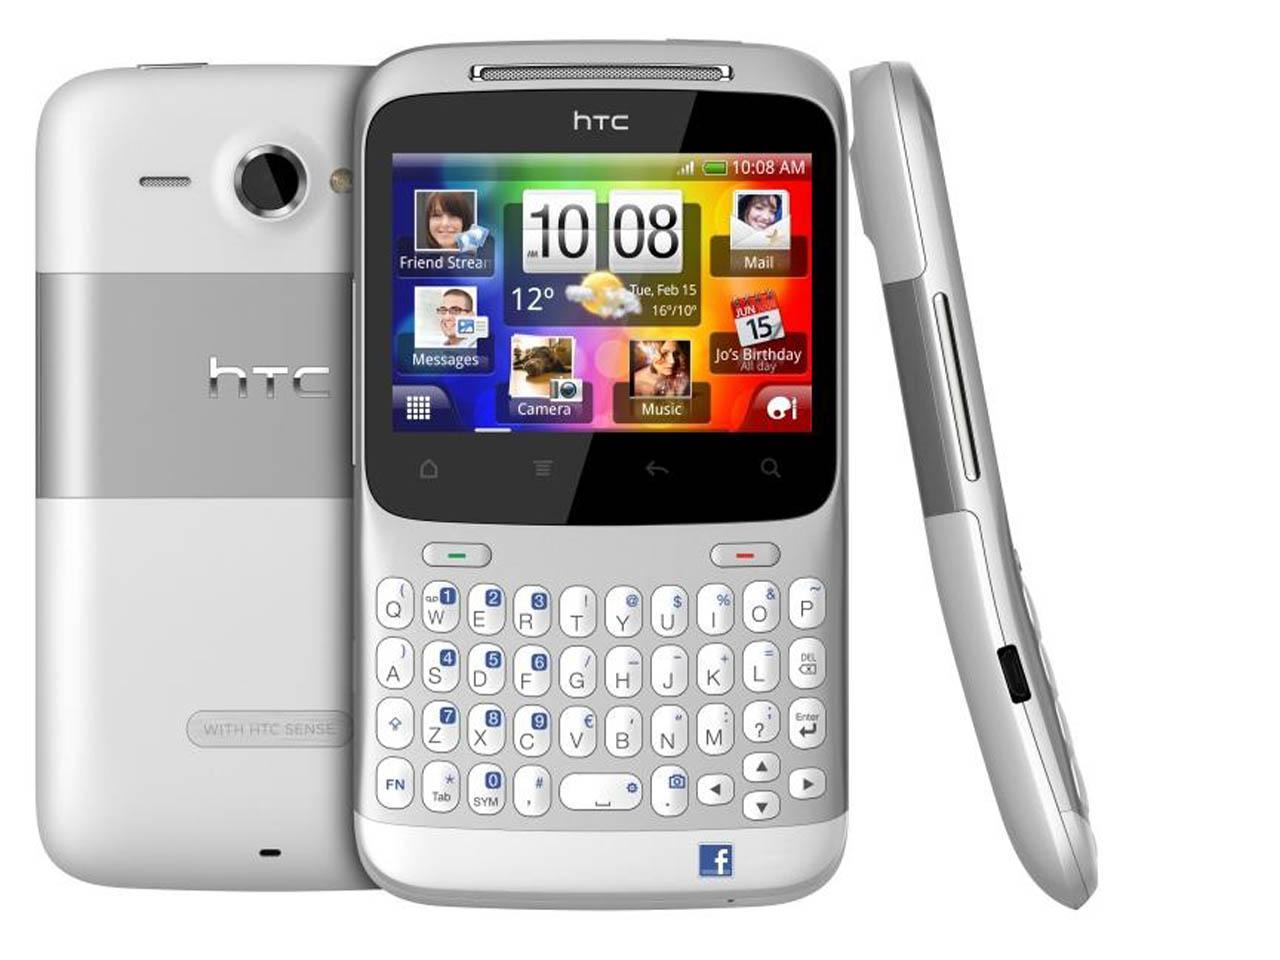 http://4.bp.blogspot.com/-W_ffNrXZHdA/TlnrBtJlsWI/AAAAAAAABAc/02XZVqHcuSU/s1600/HTC+ChaCha+Facebook+Android+Mobile.JPG